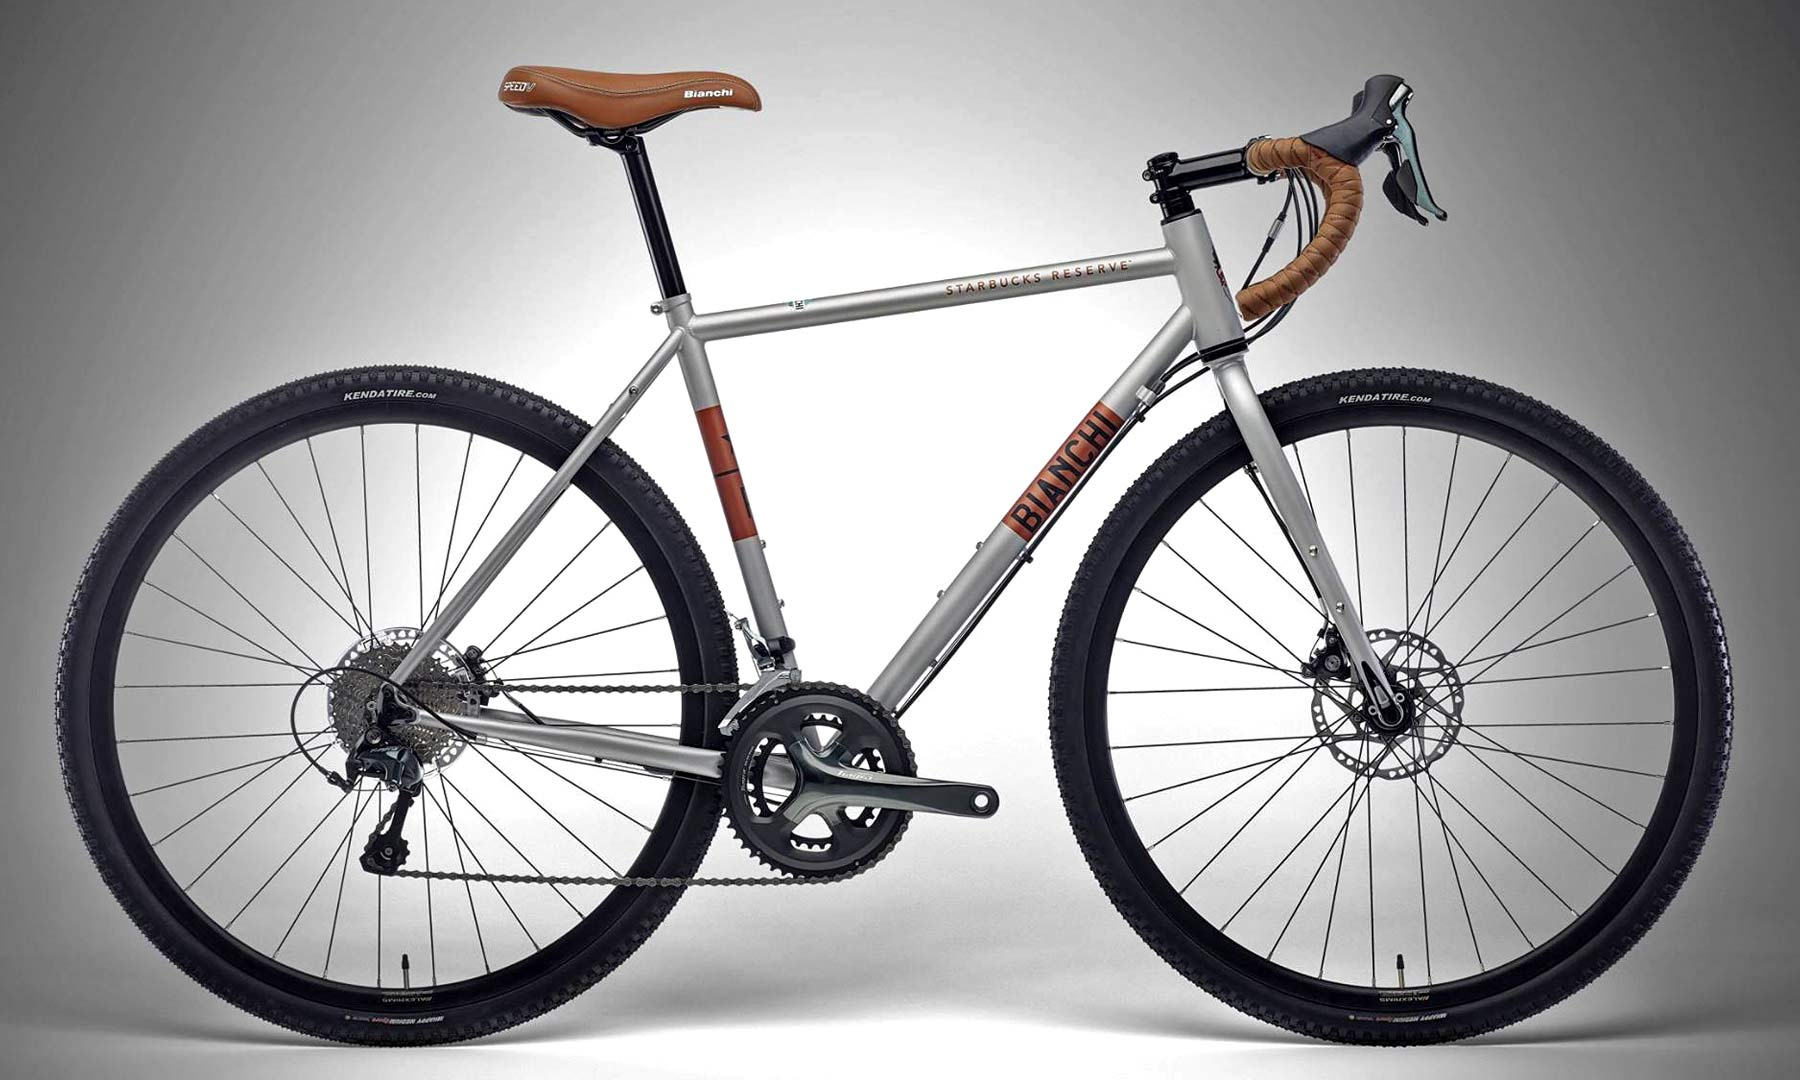 Bianchi-x-Starbucks-Reserve_limited-edition-steel-gravel-bike_complete.jpg